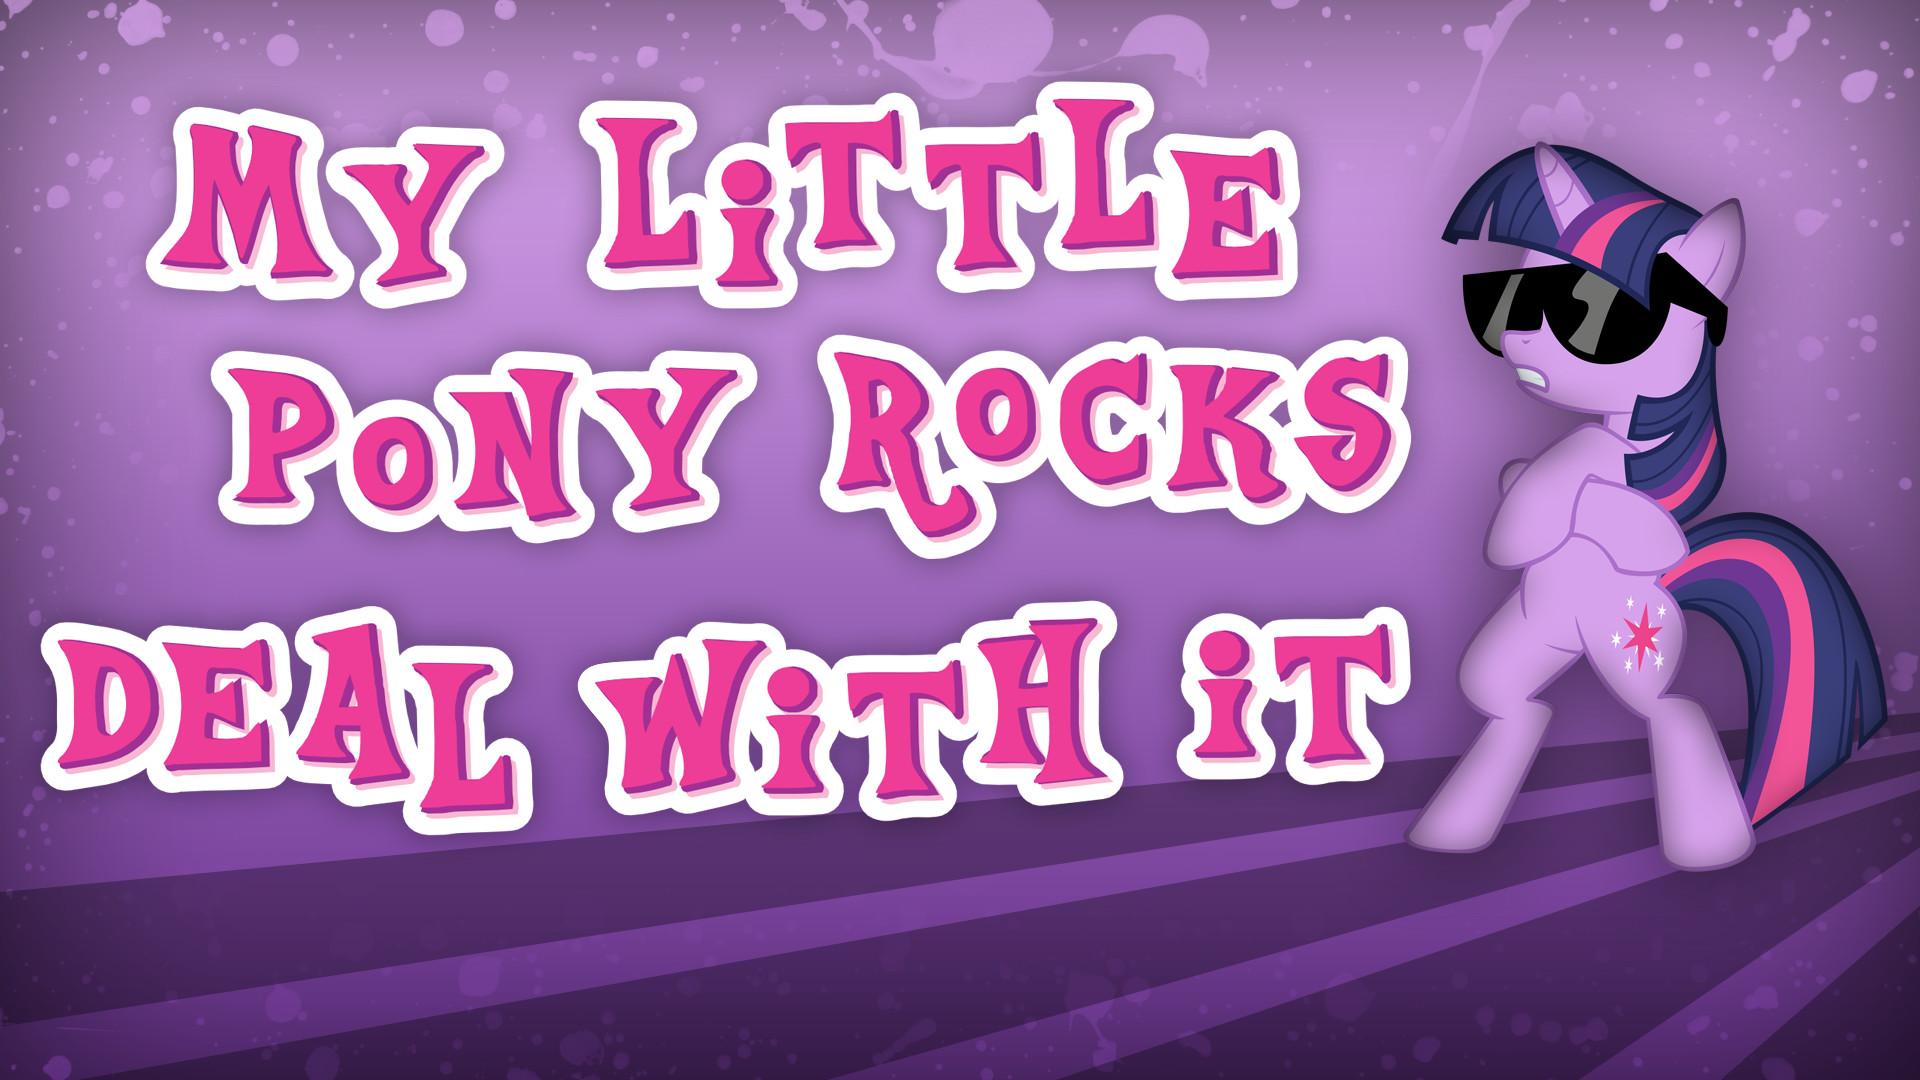 … My Little Pony Rocks Wallpaper by Dipi11